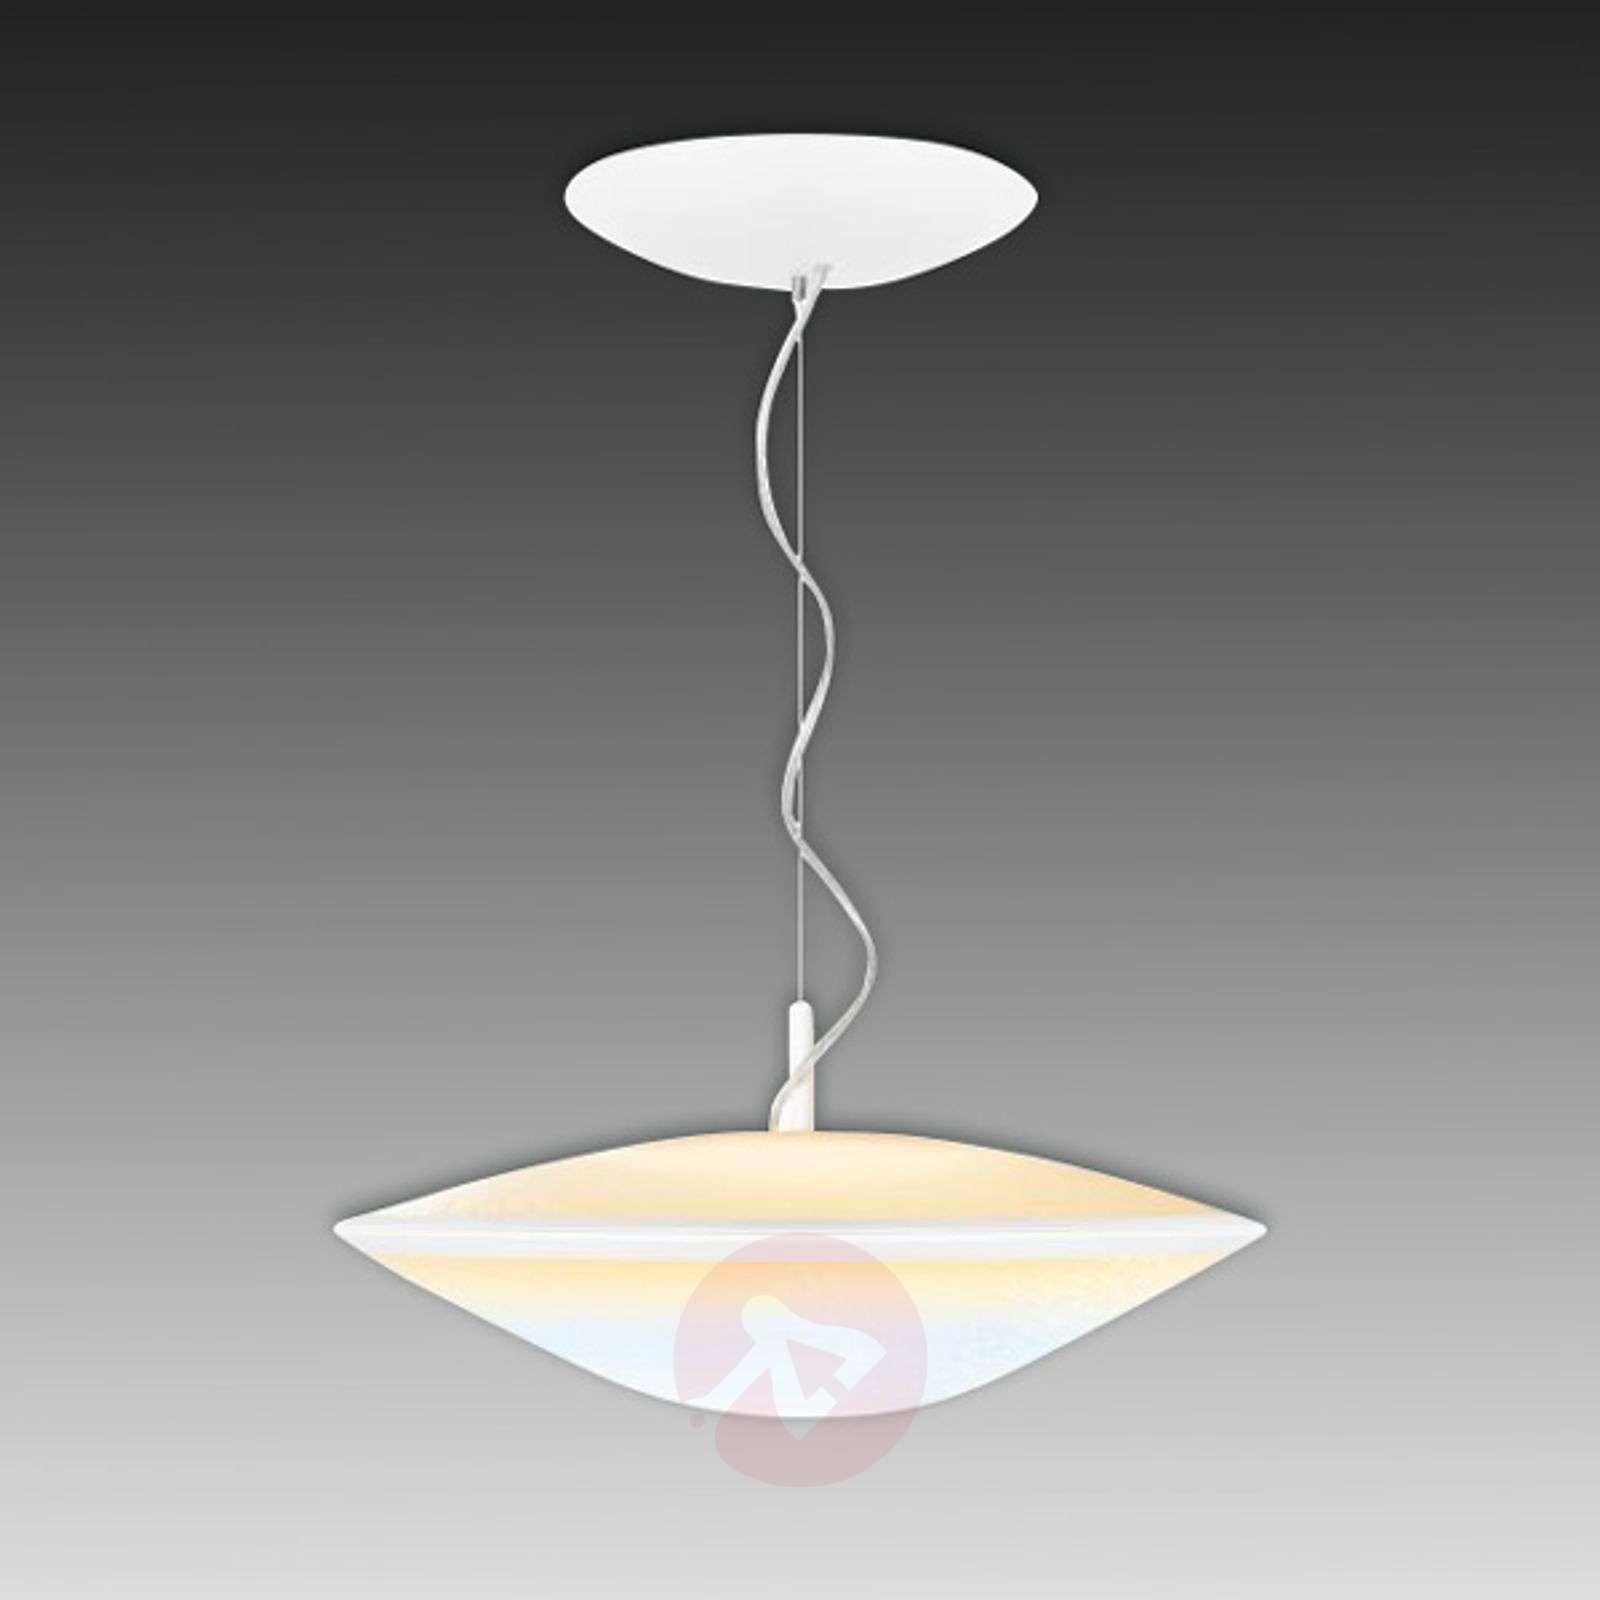 Philips Hue Phoenix pendant light, White Ambiance-7531605-01